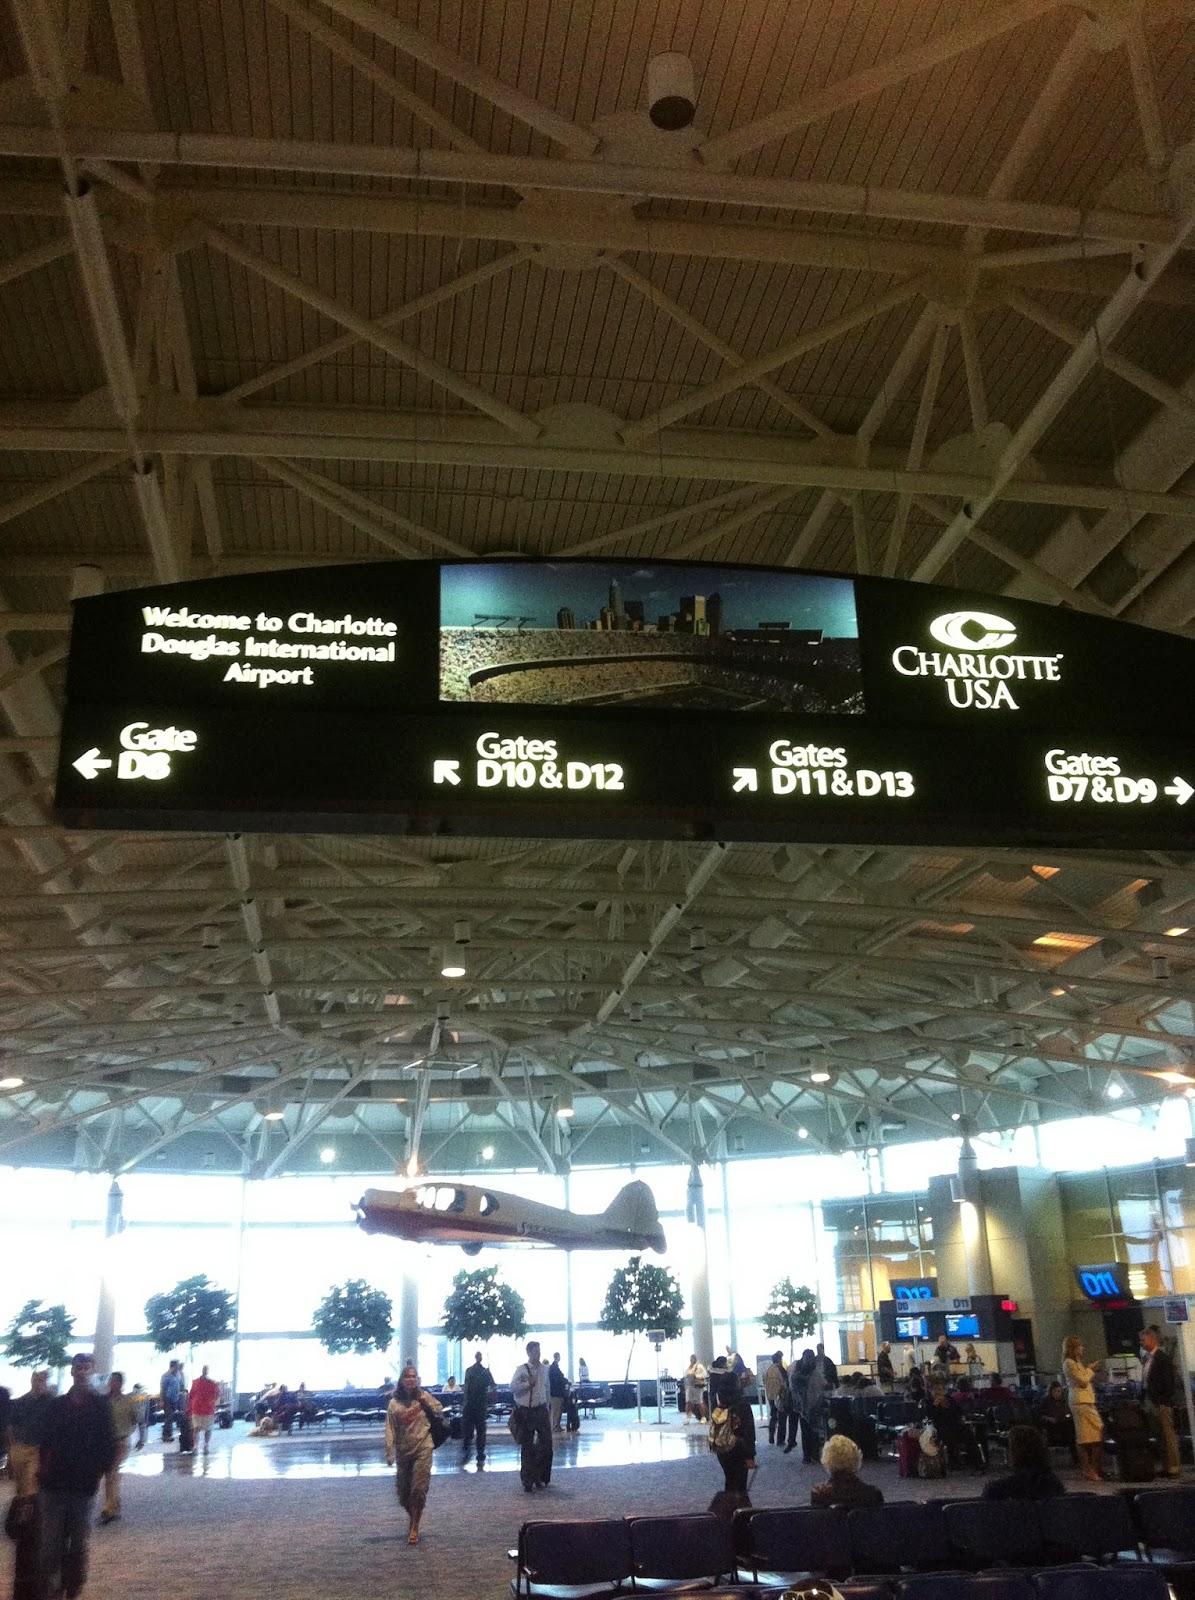 Aeroporto Charlotte